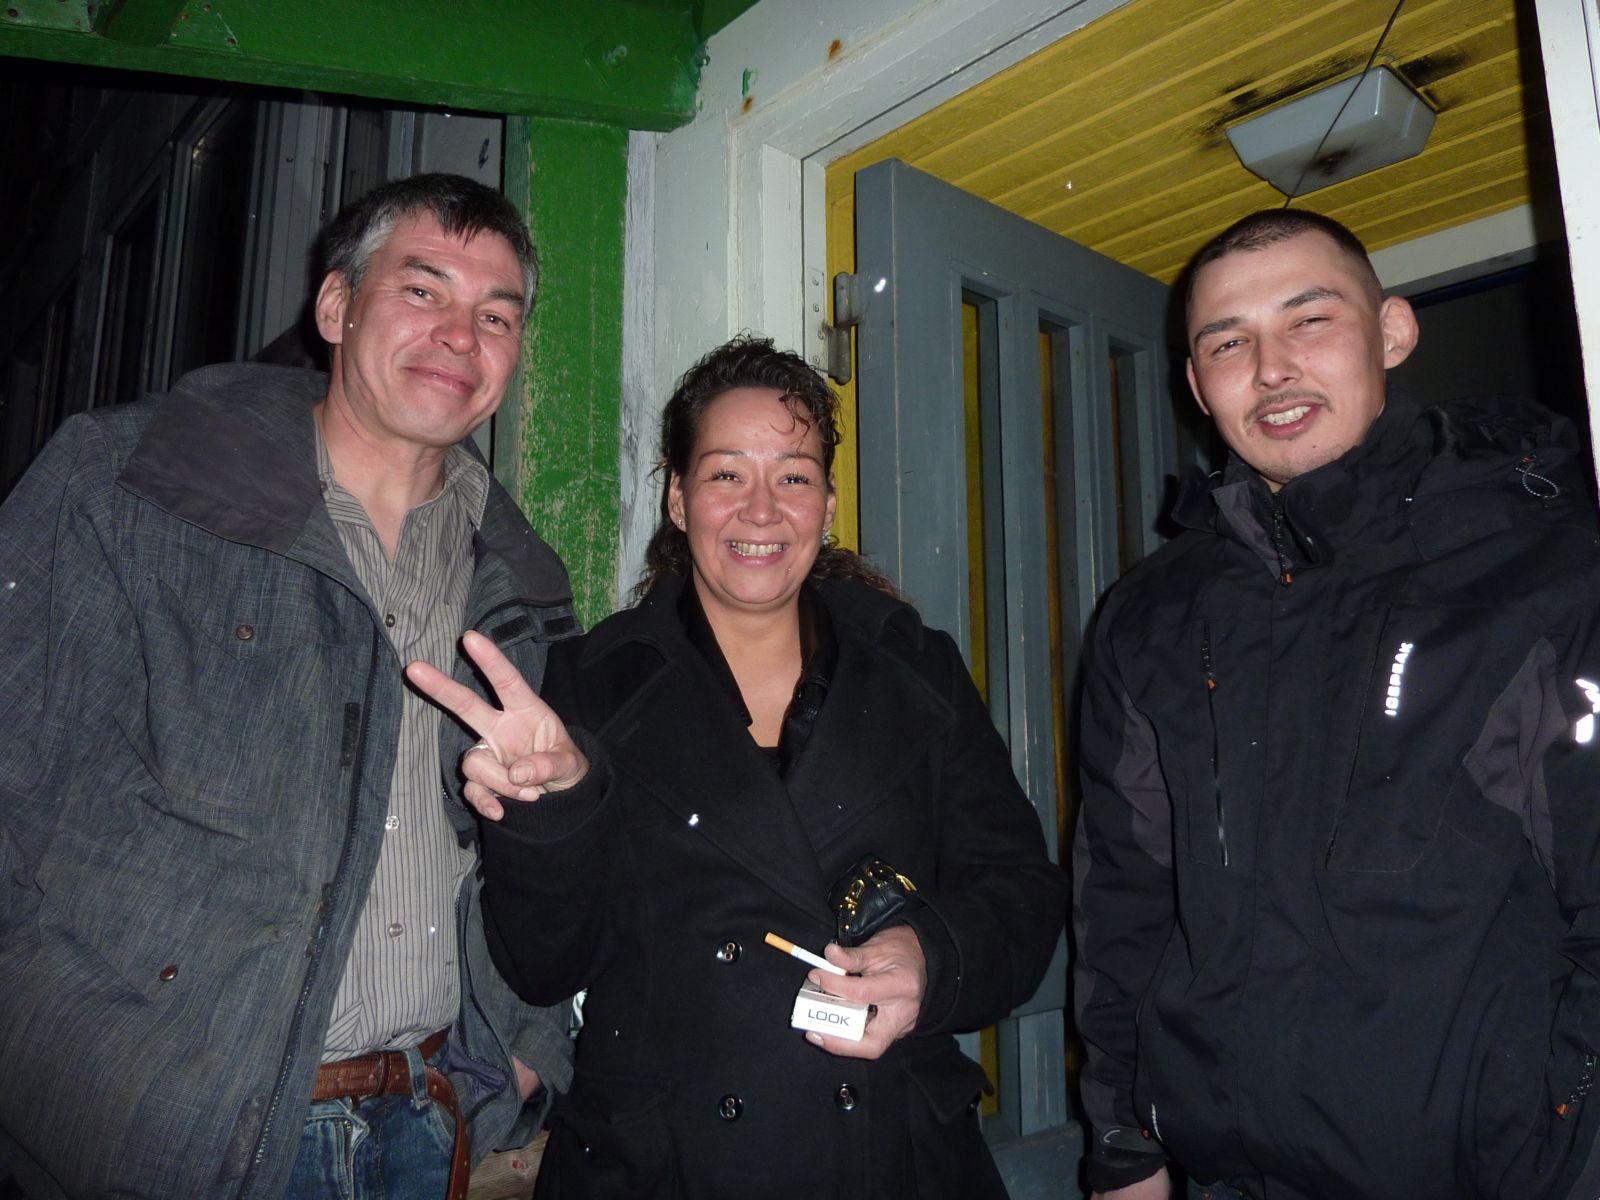 2010-03-14-0328_-_Jens Larsen; Peter_; Peters_Kone_3